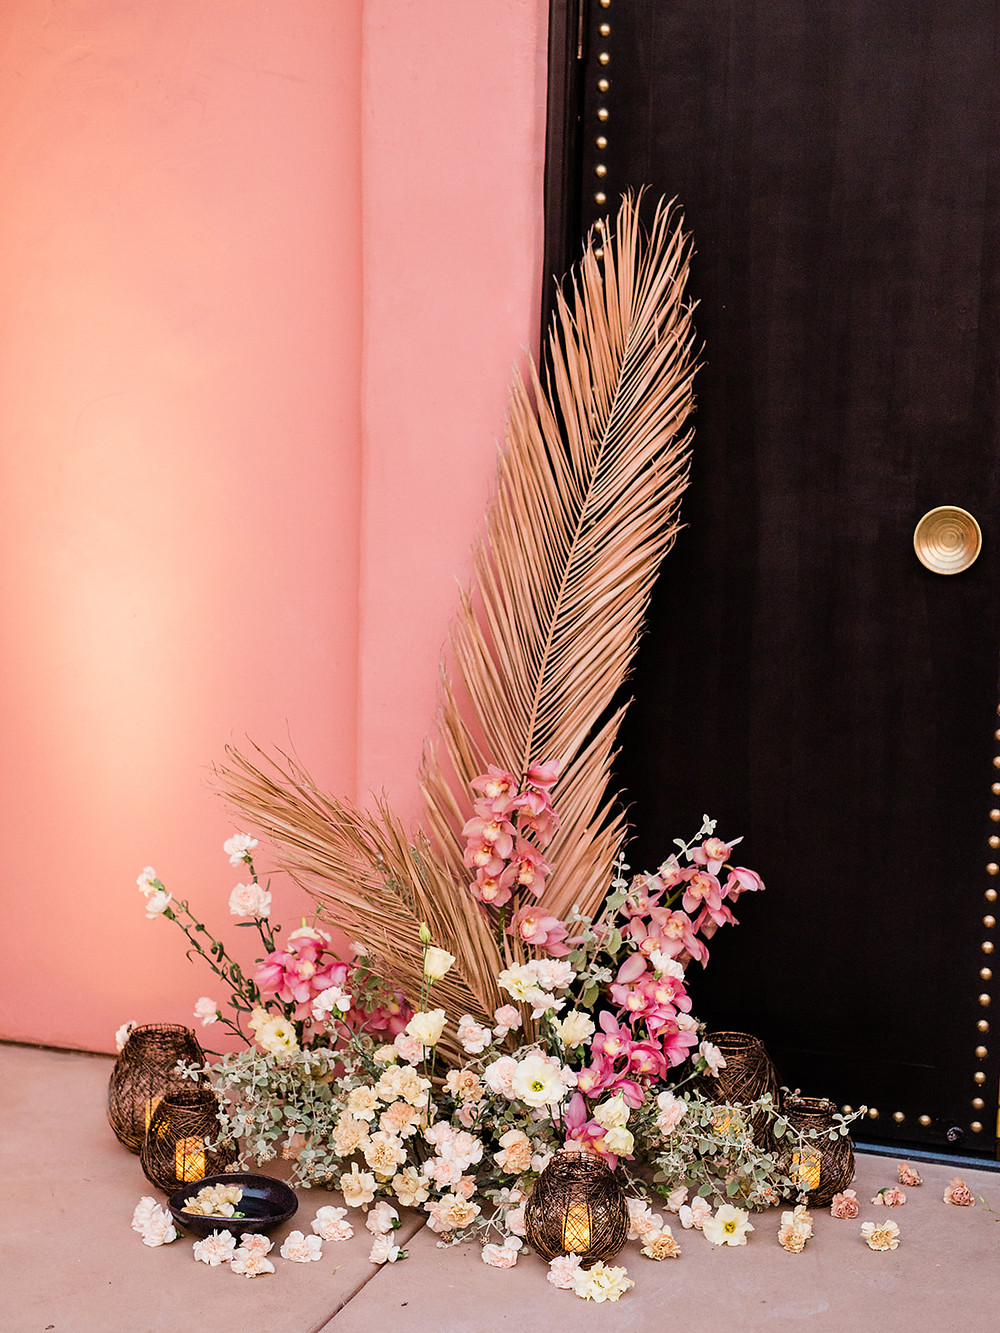 ceremony design - Modern Moroccan Desert Glam Editorial - LGBTQ Wedding Editoiral - Wedding Design Inspiration - Muted Desert Tones - Modern Glam Jungle Chic